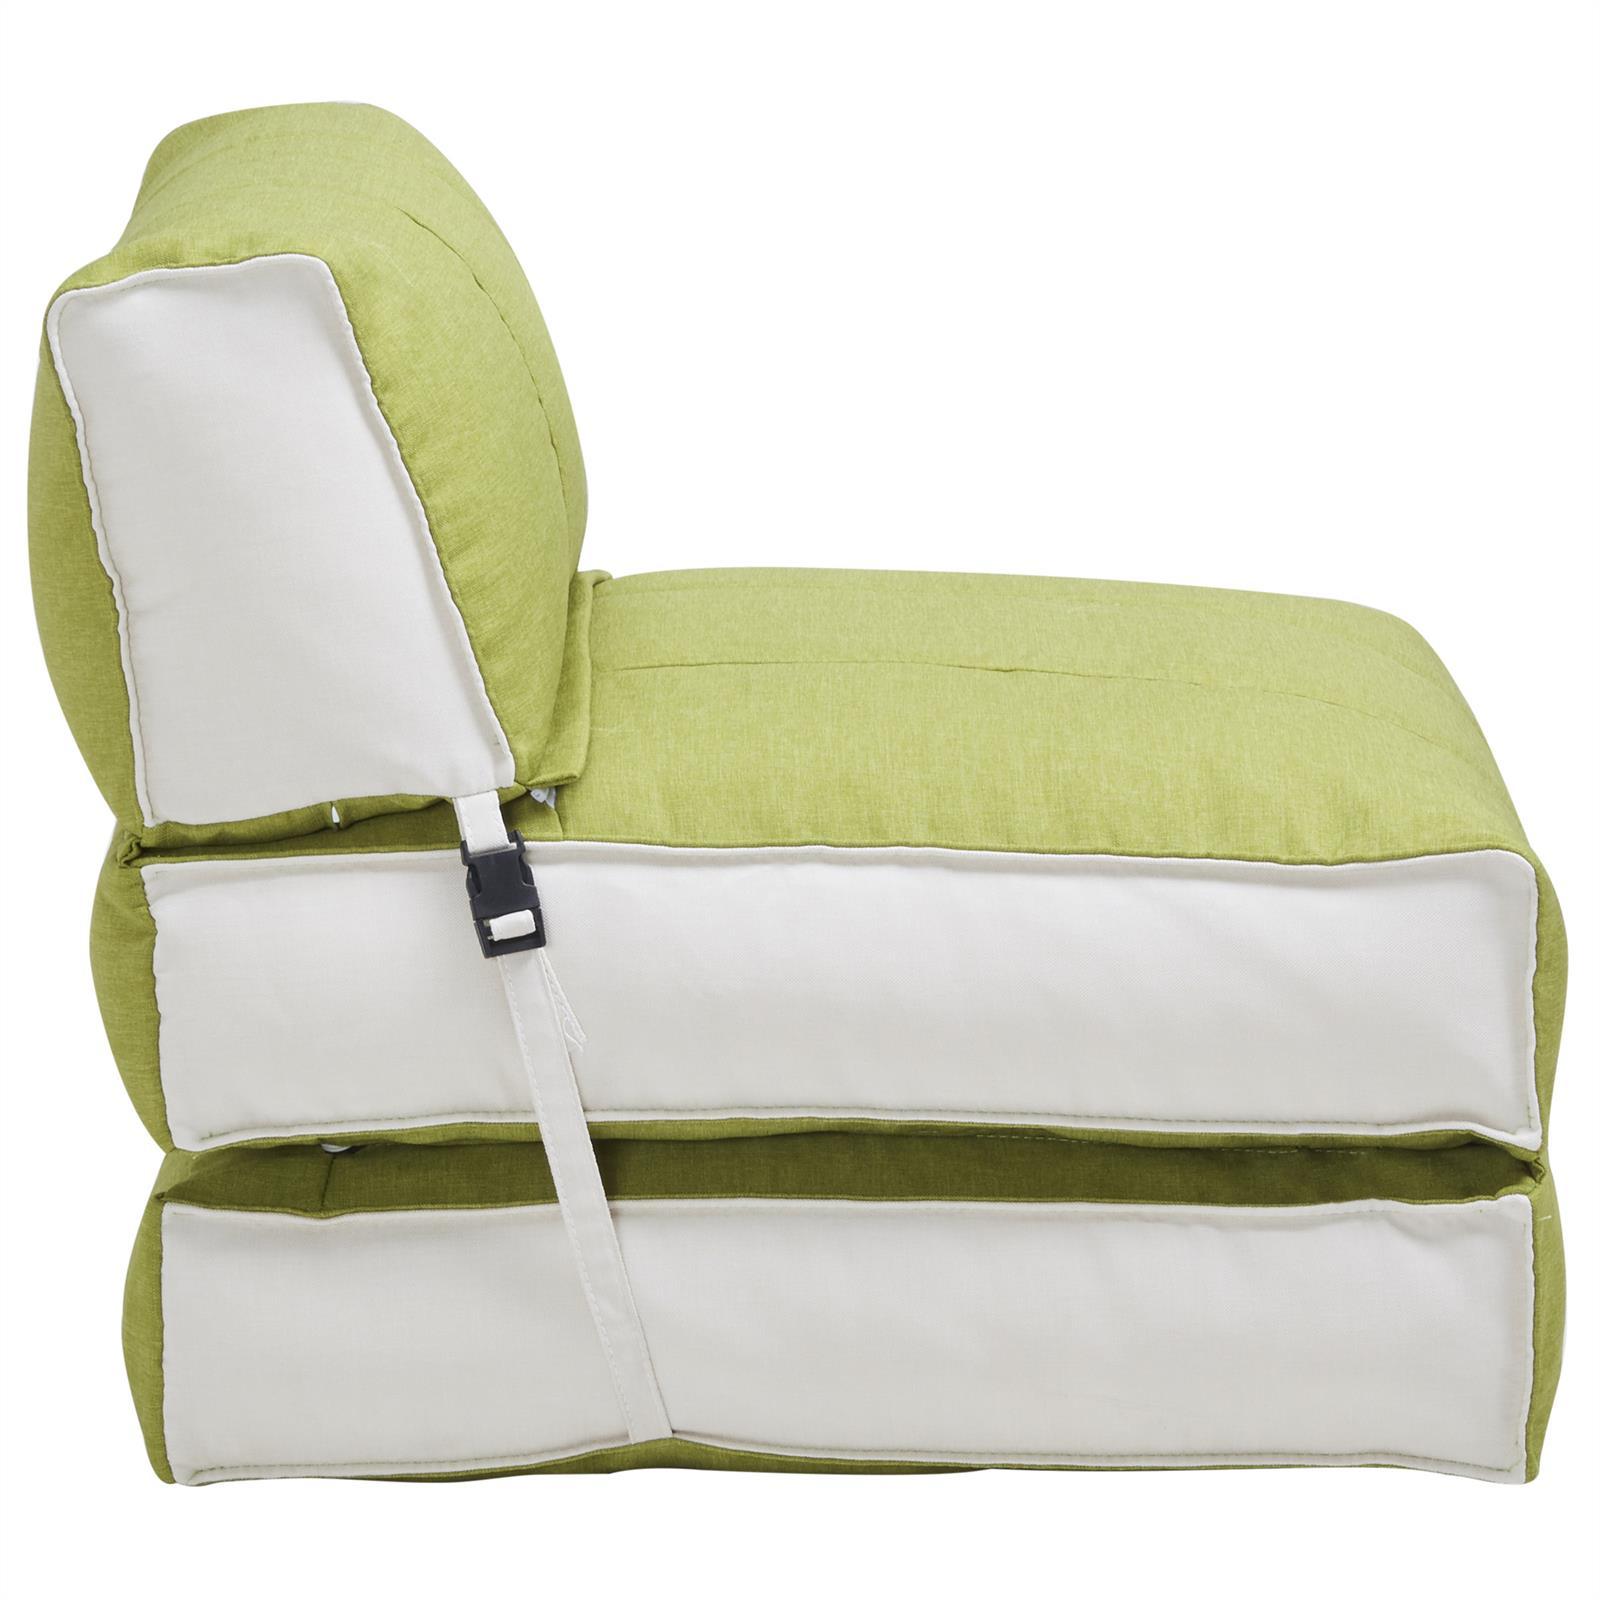 schlafsessel faltmatratze g stebett klappmatratze g stematratze bettsessel ebay. Black Bedroom Furniture Sets. Home Design Ideas